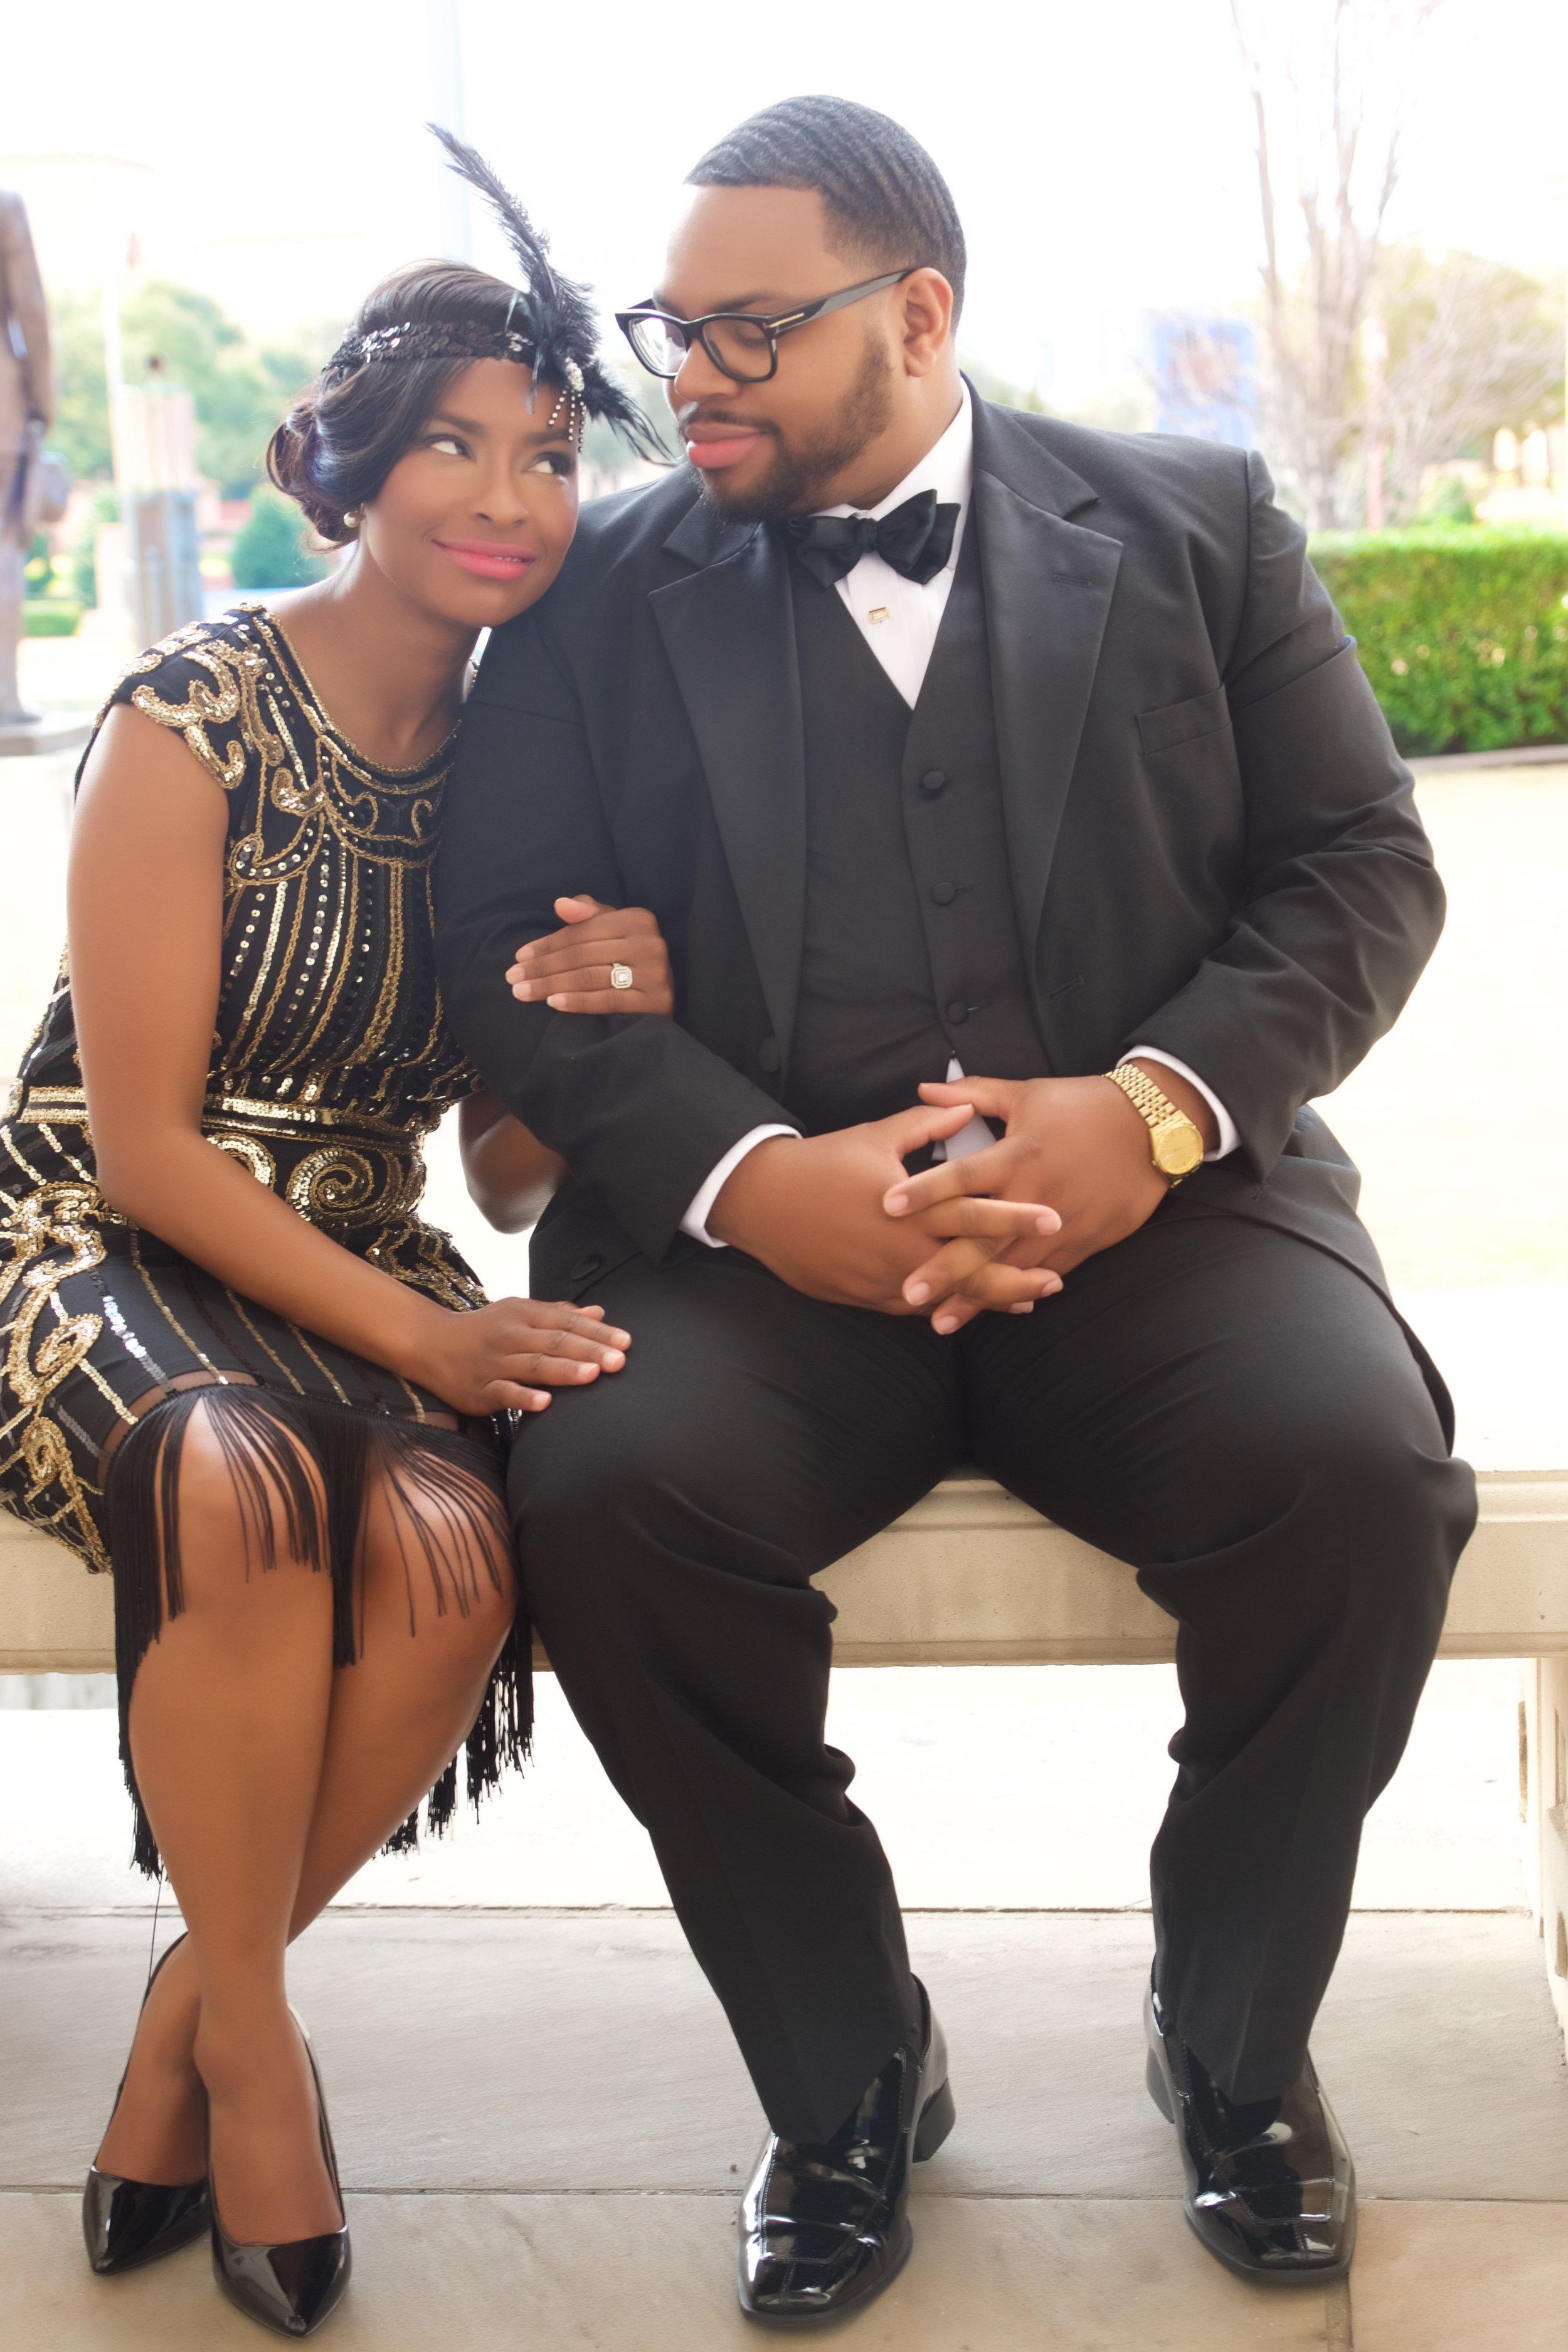 Xavier Jordan Photography - couple - save the date  XJ (29).jpg